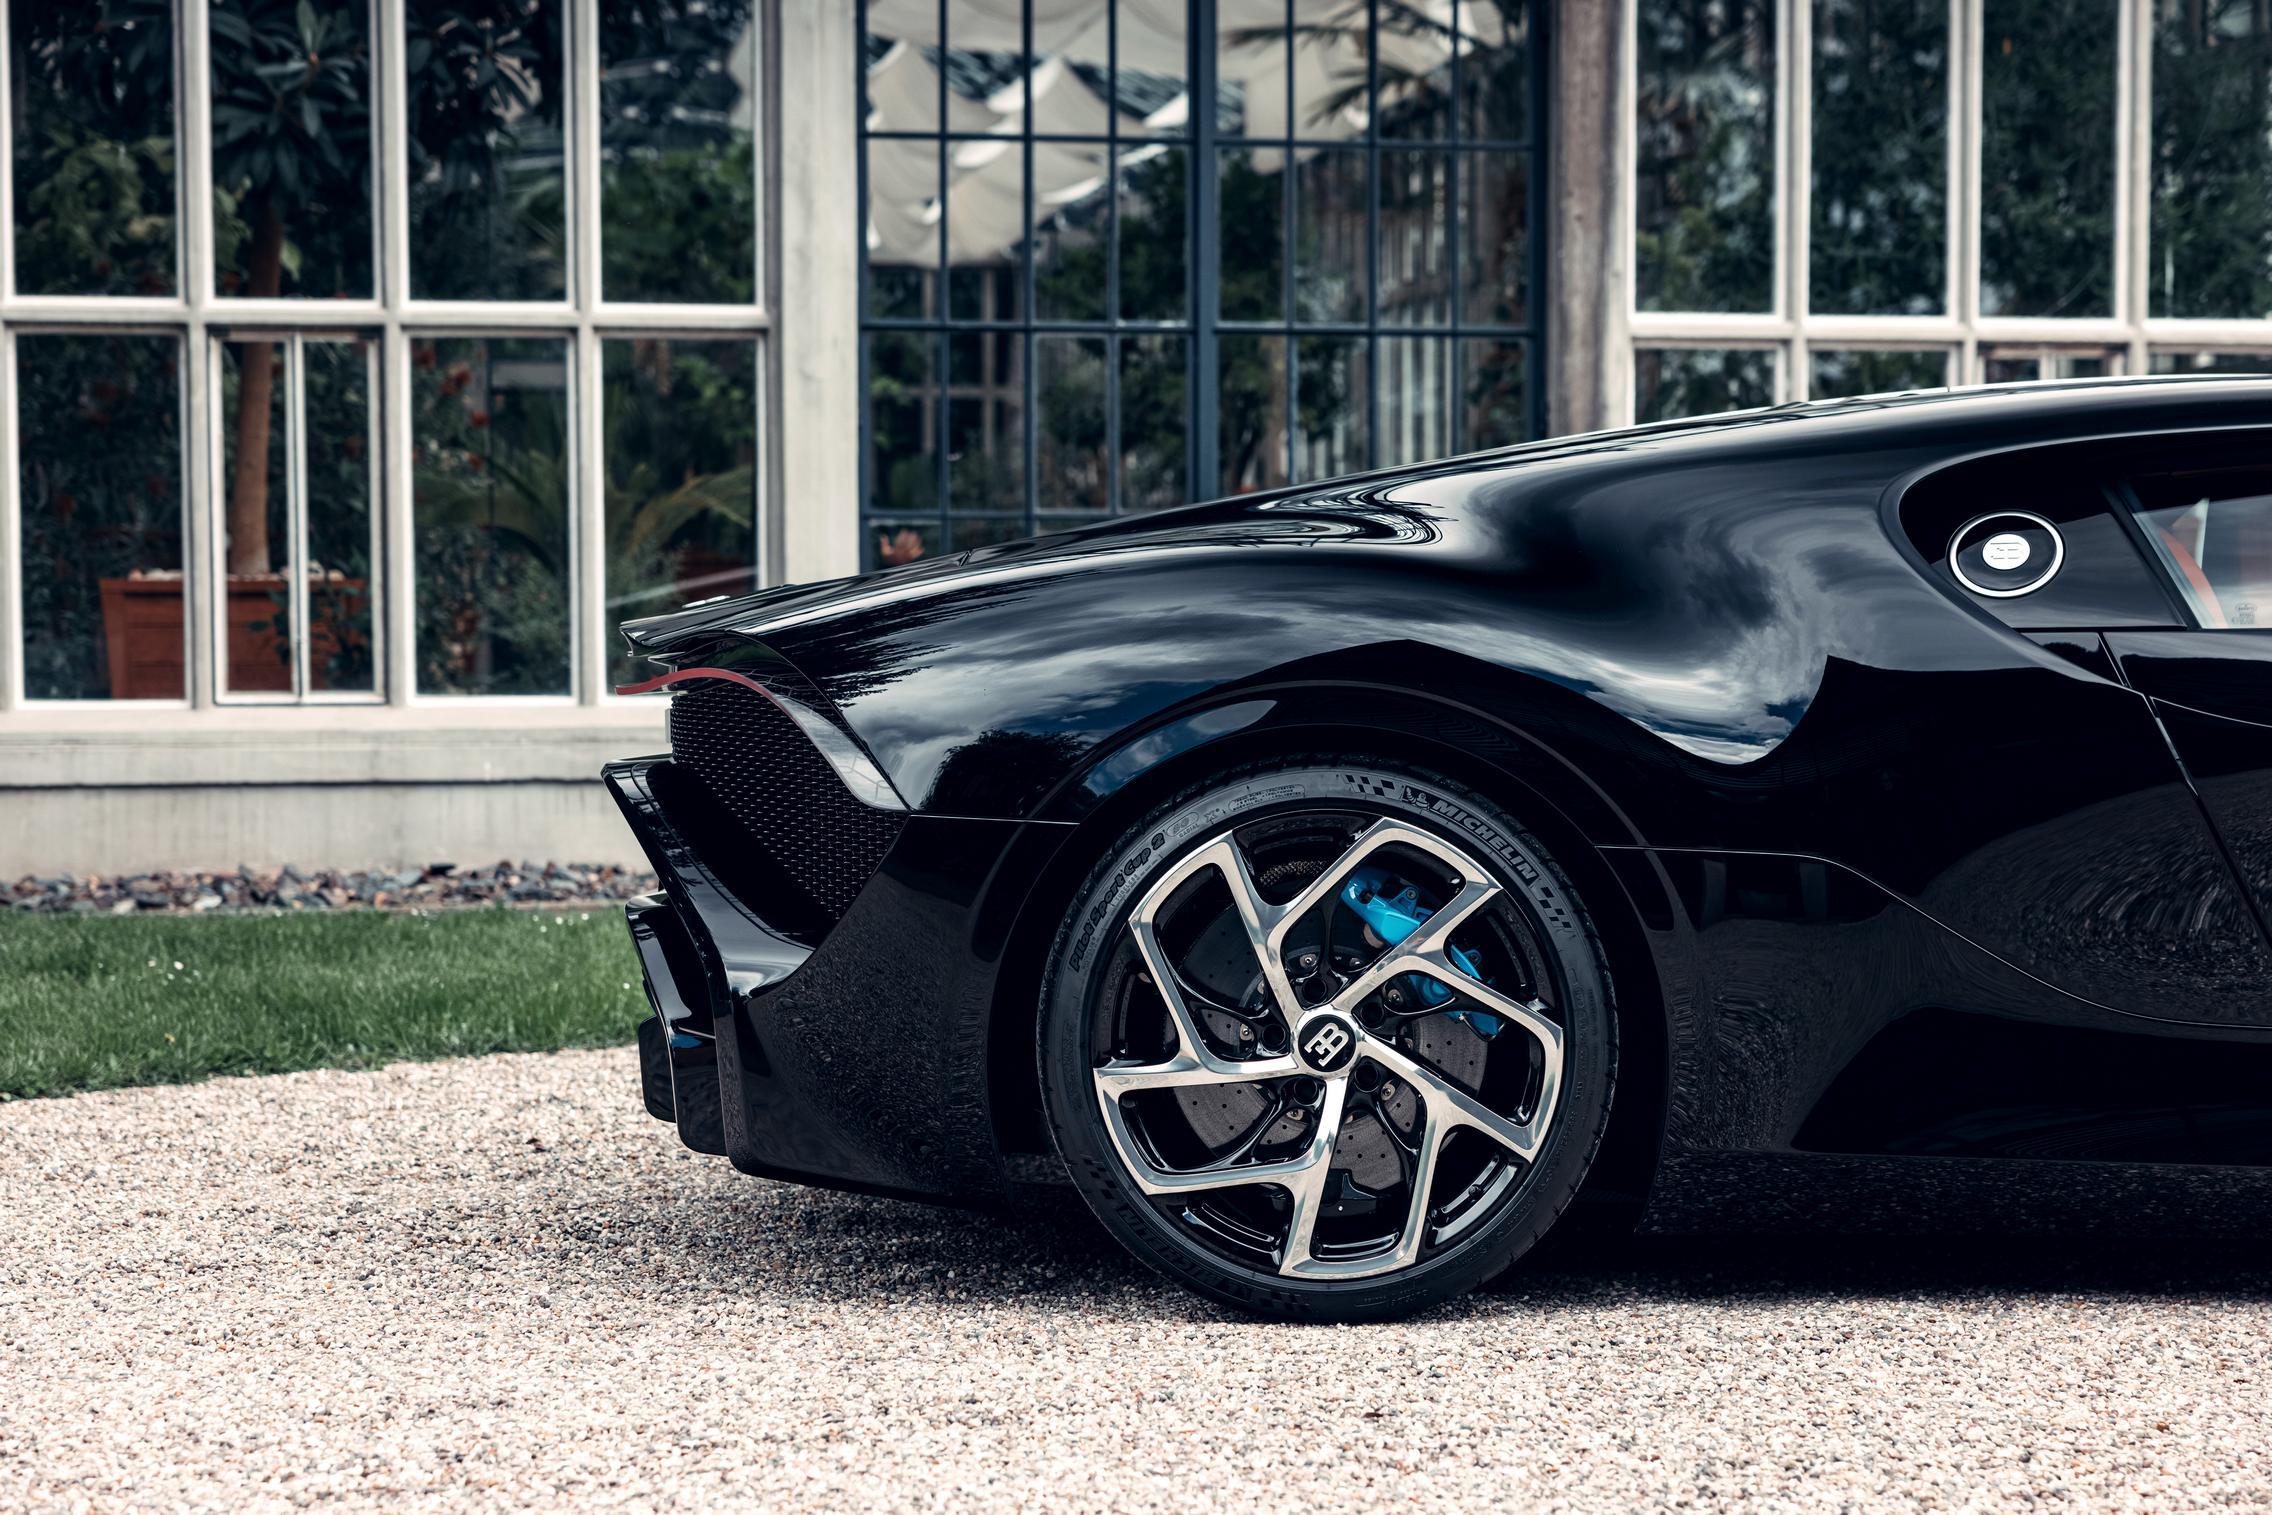 Bugatti La Voiture Noire wheels